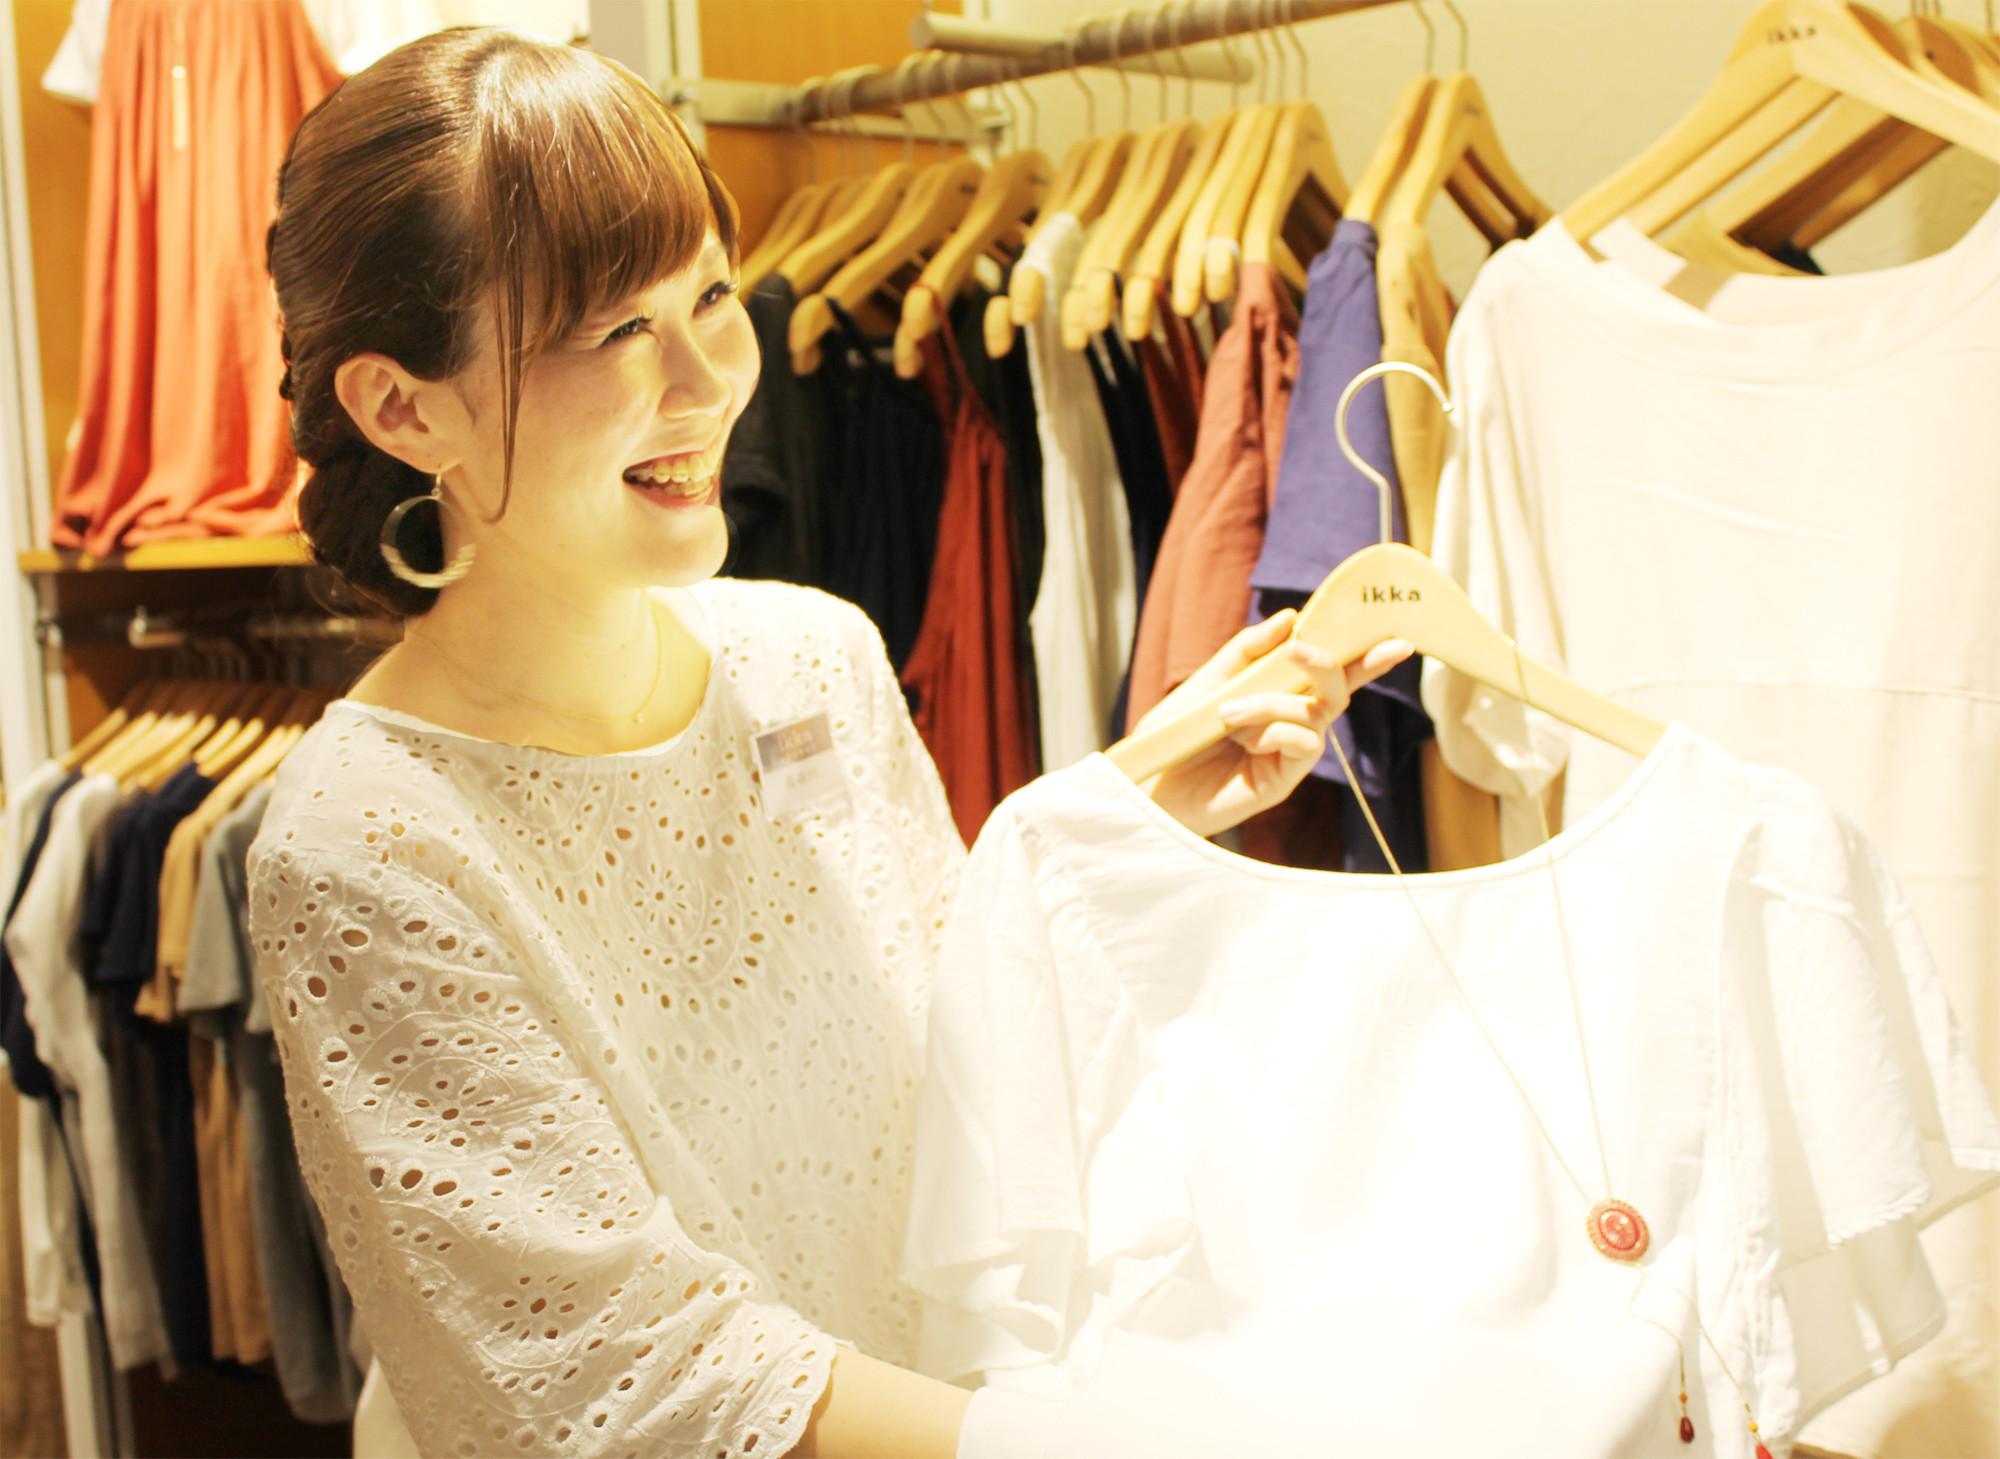 CURRENT(カレント) 神戸ハーバーランドumie店 のアルバイト情報